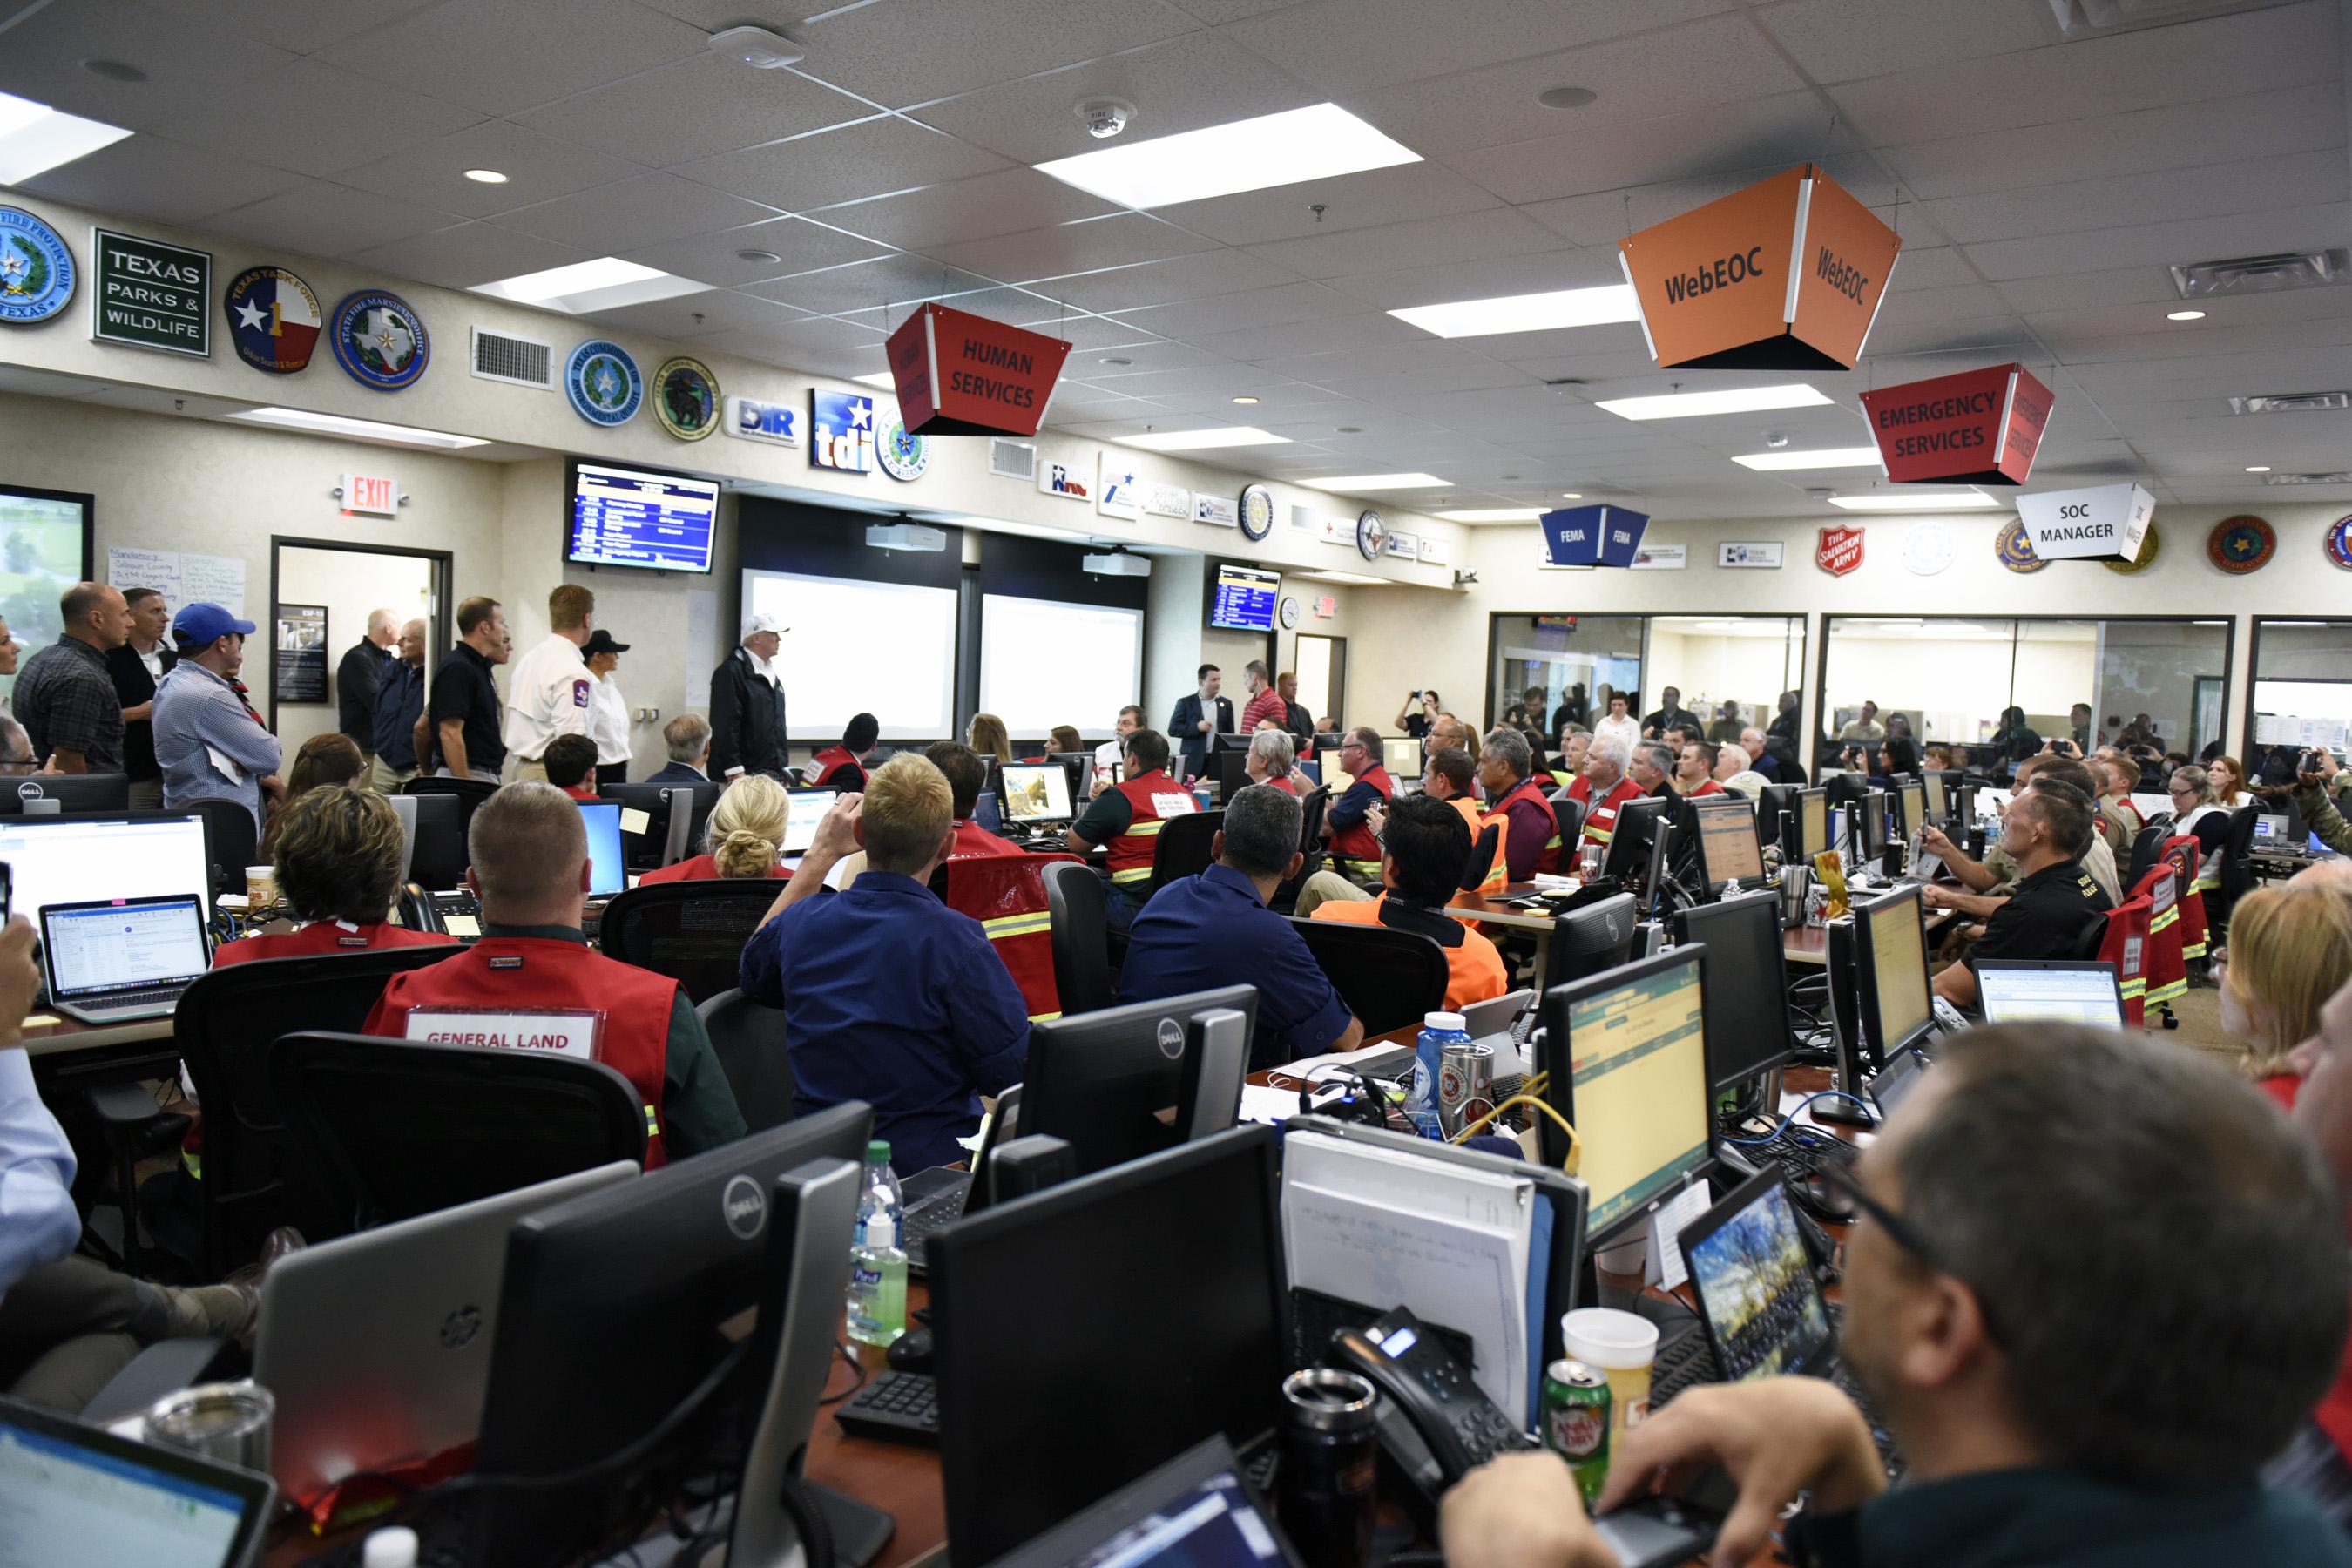 File:Hurricane Harvey Response (36806424591) jpg - Wikimedia Commons